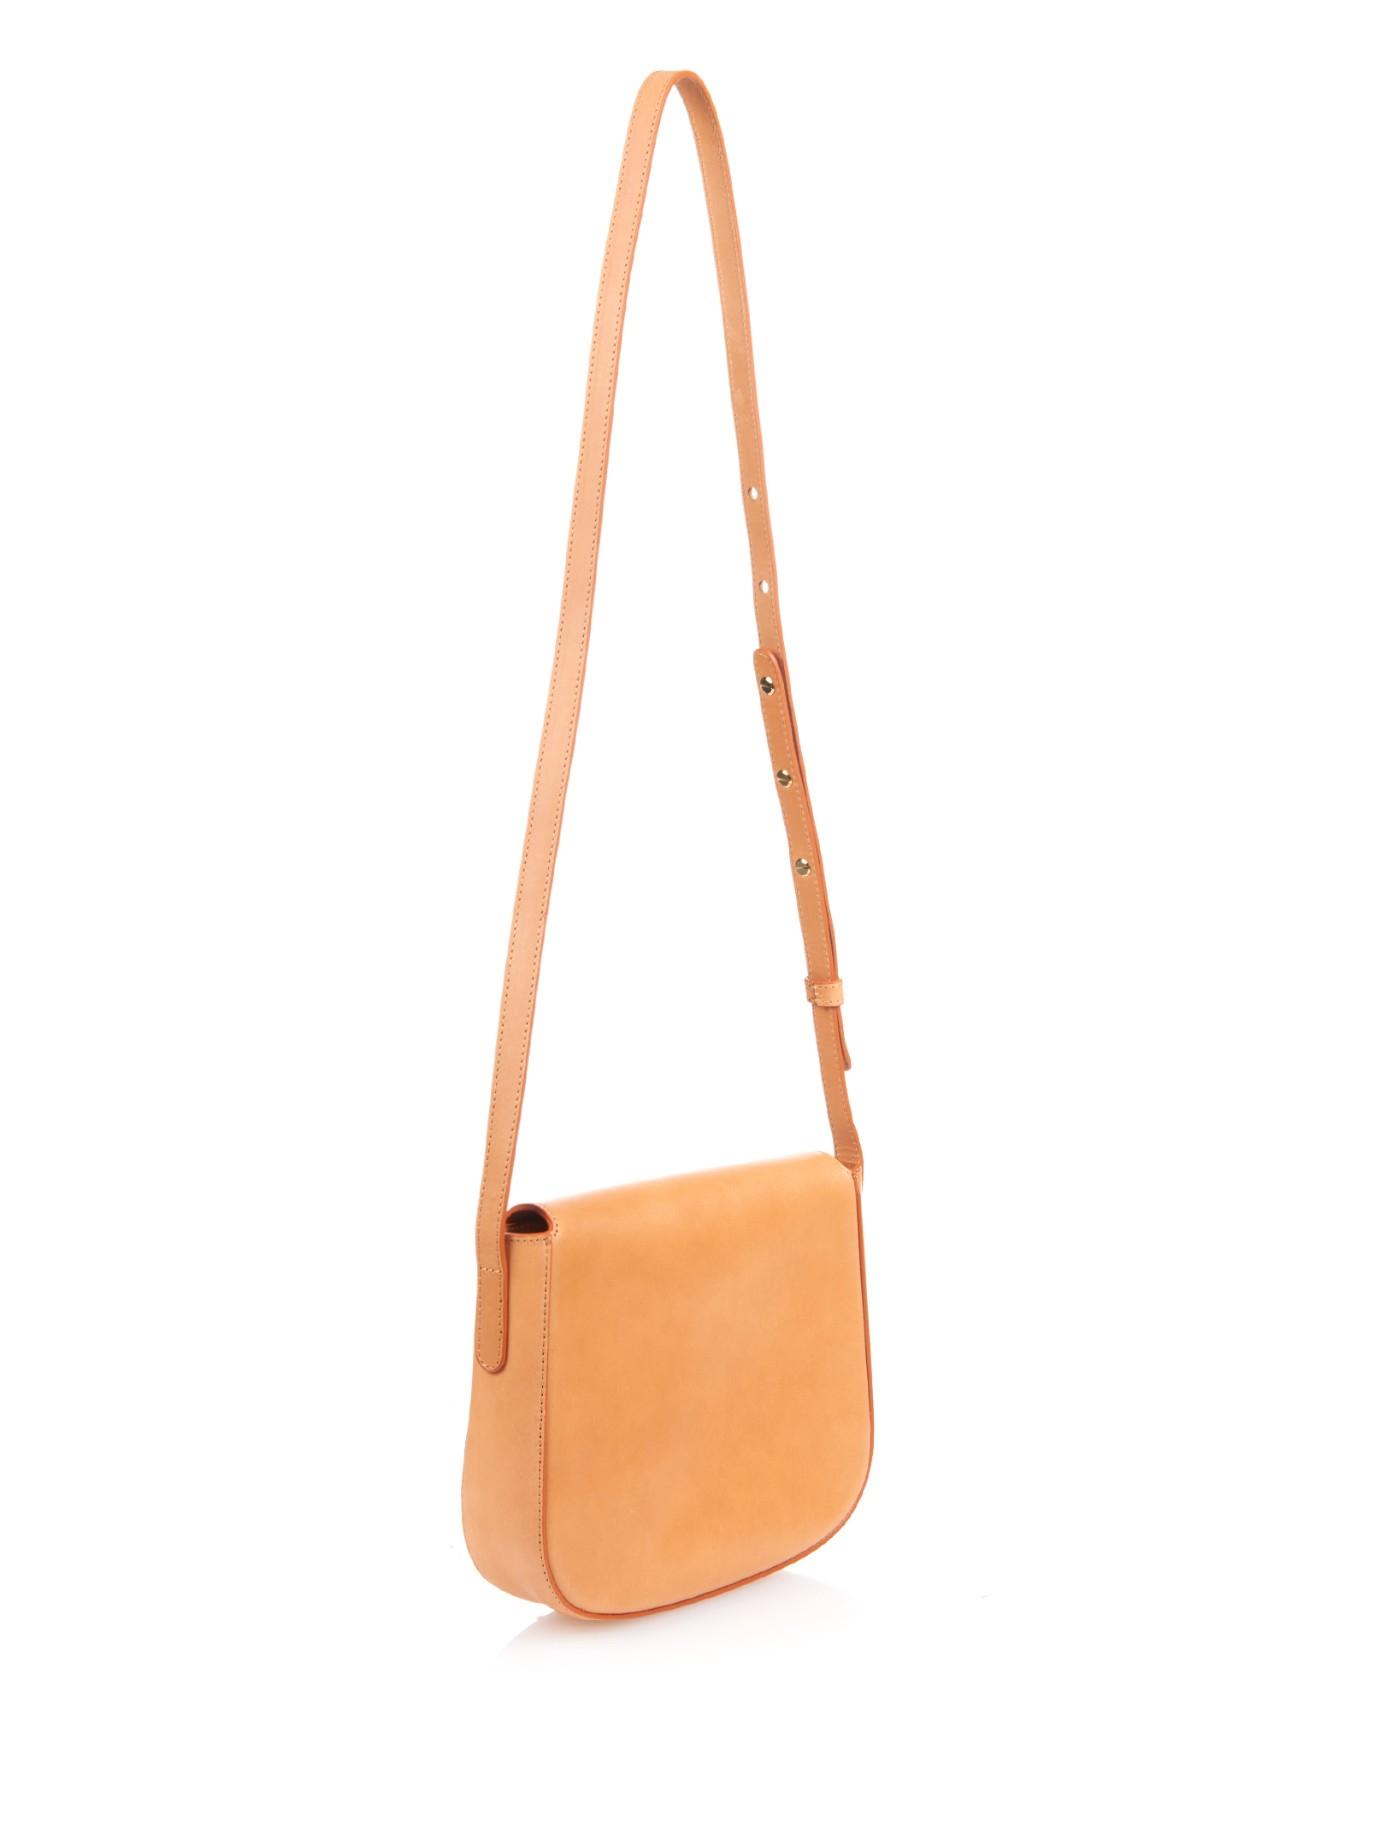 hermes birkin inspired handbags - Mansur gavriel Vegetable-Tanned Leather Cross-Body Bag in Brown ...